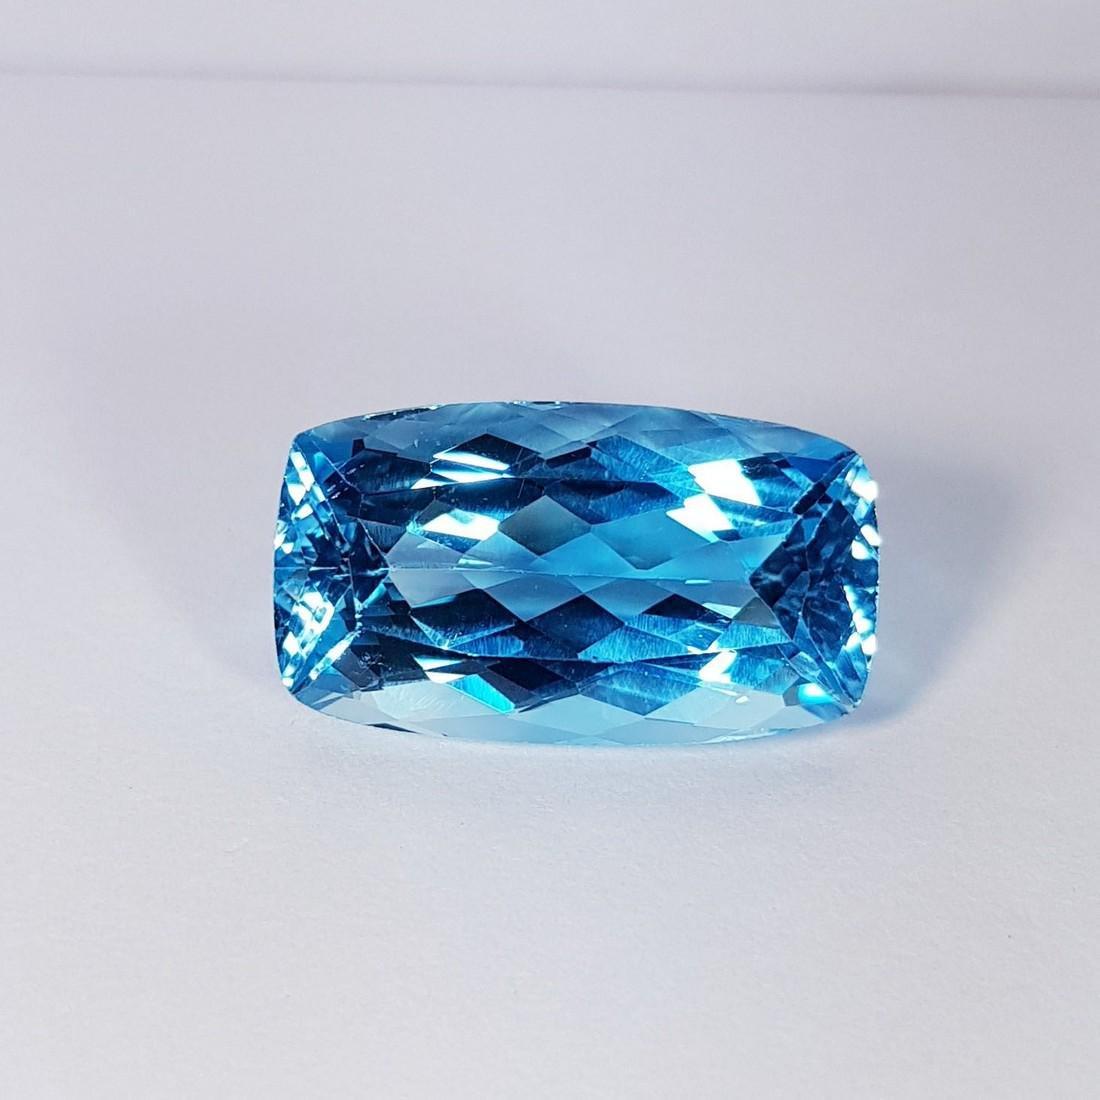 Natural Swiss Blue Topaz - 24.25 ct